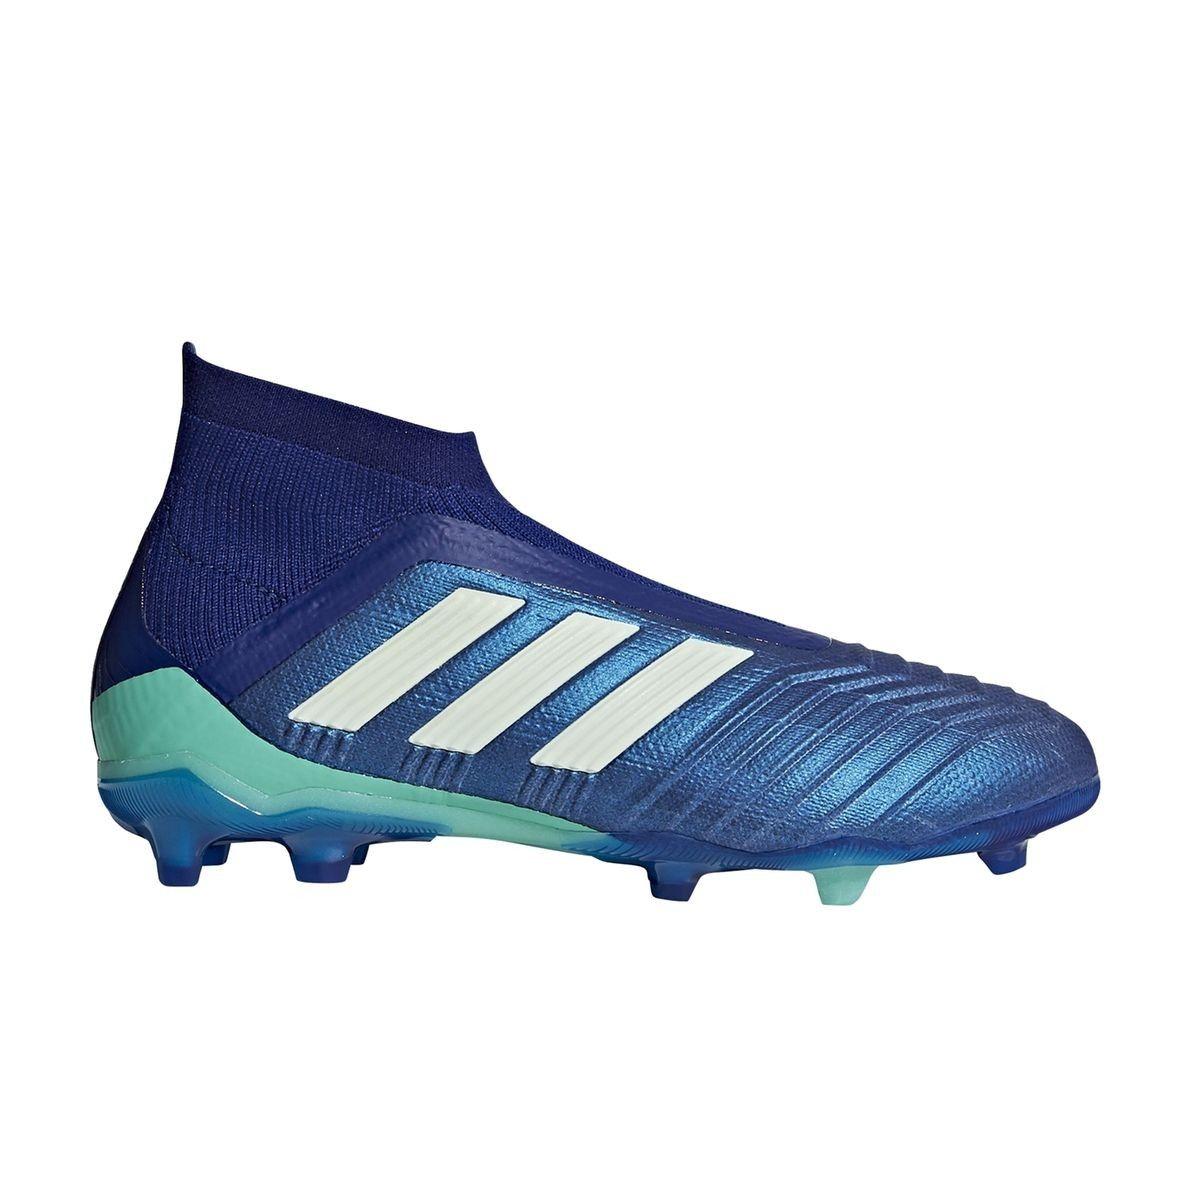 18 Football Fg Adidas De Chaussures Chaussure Predator X7xHgwcq4